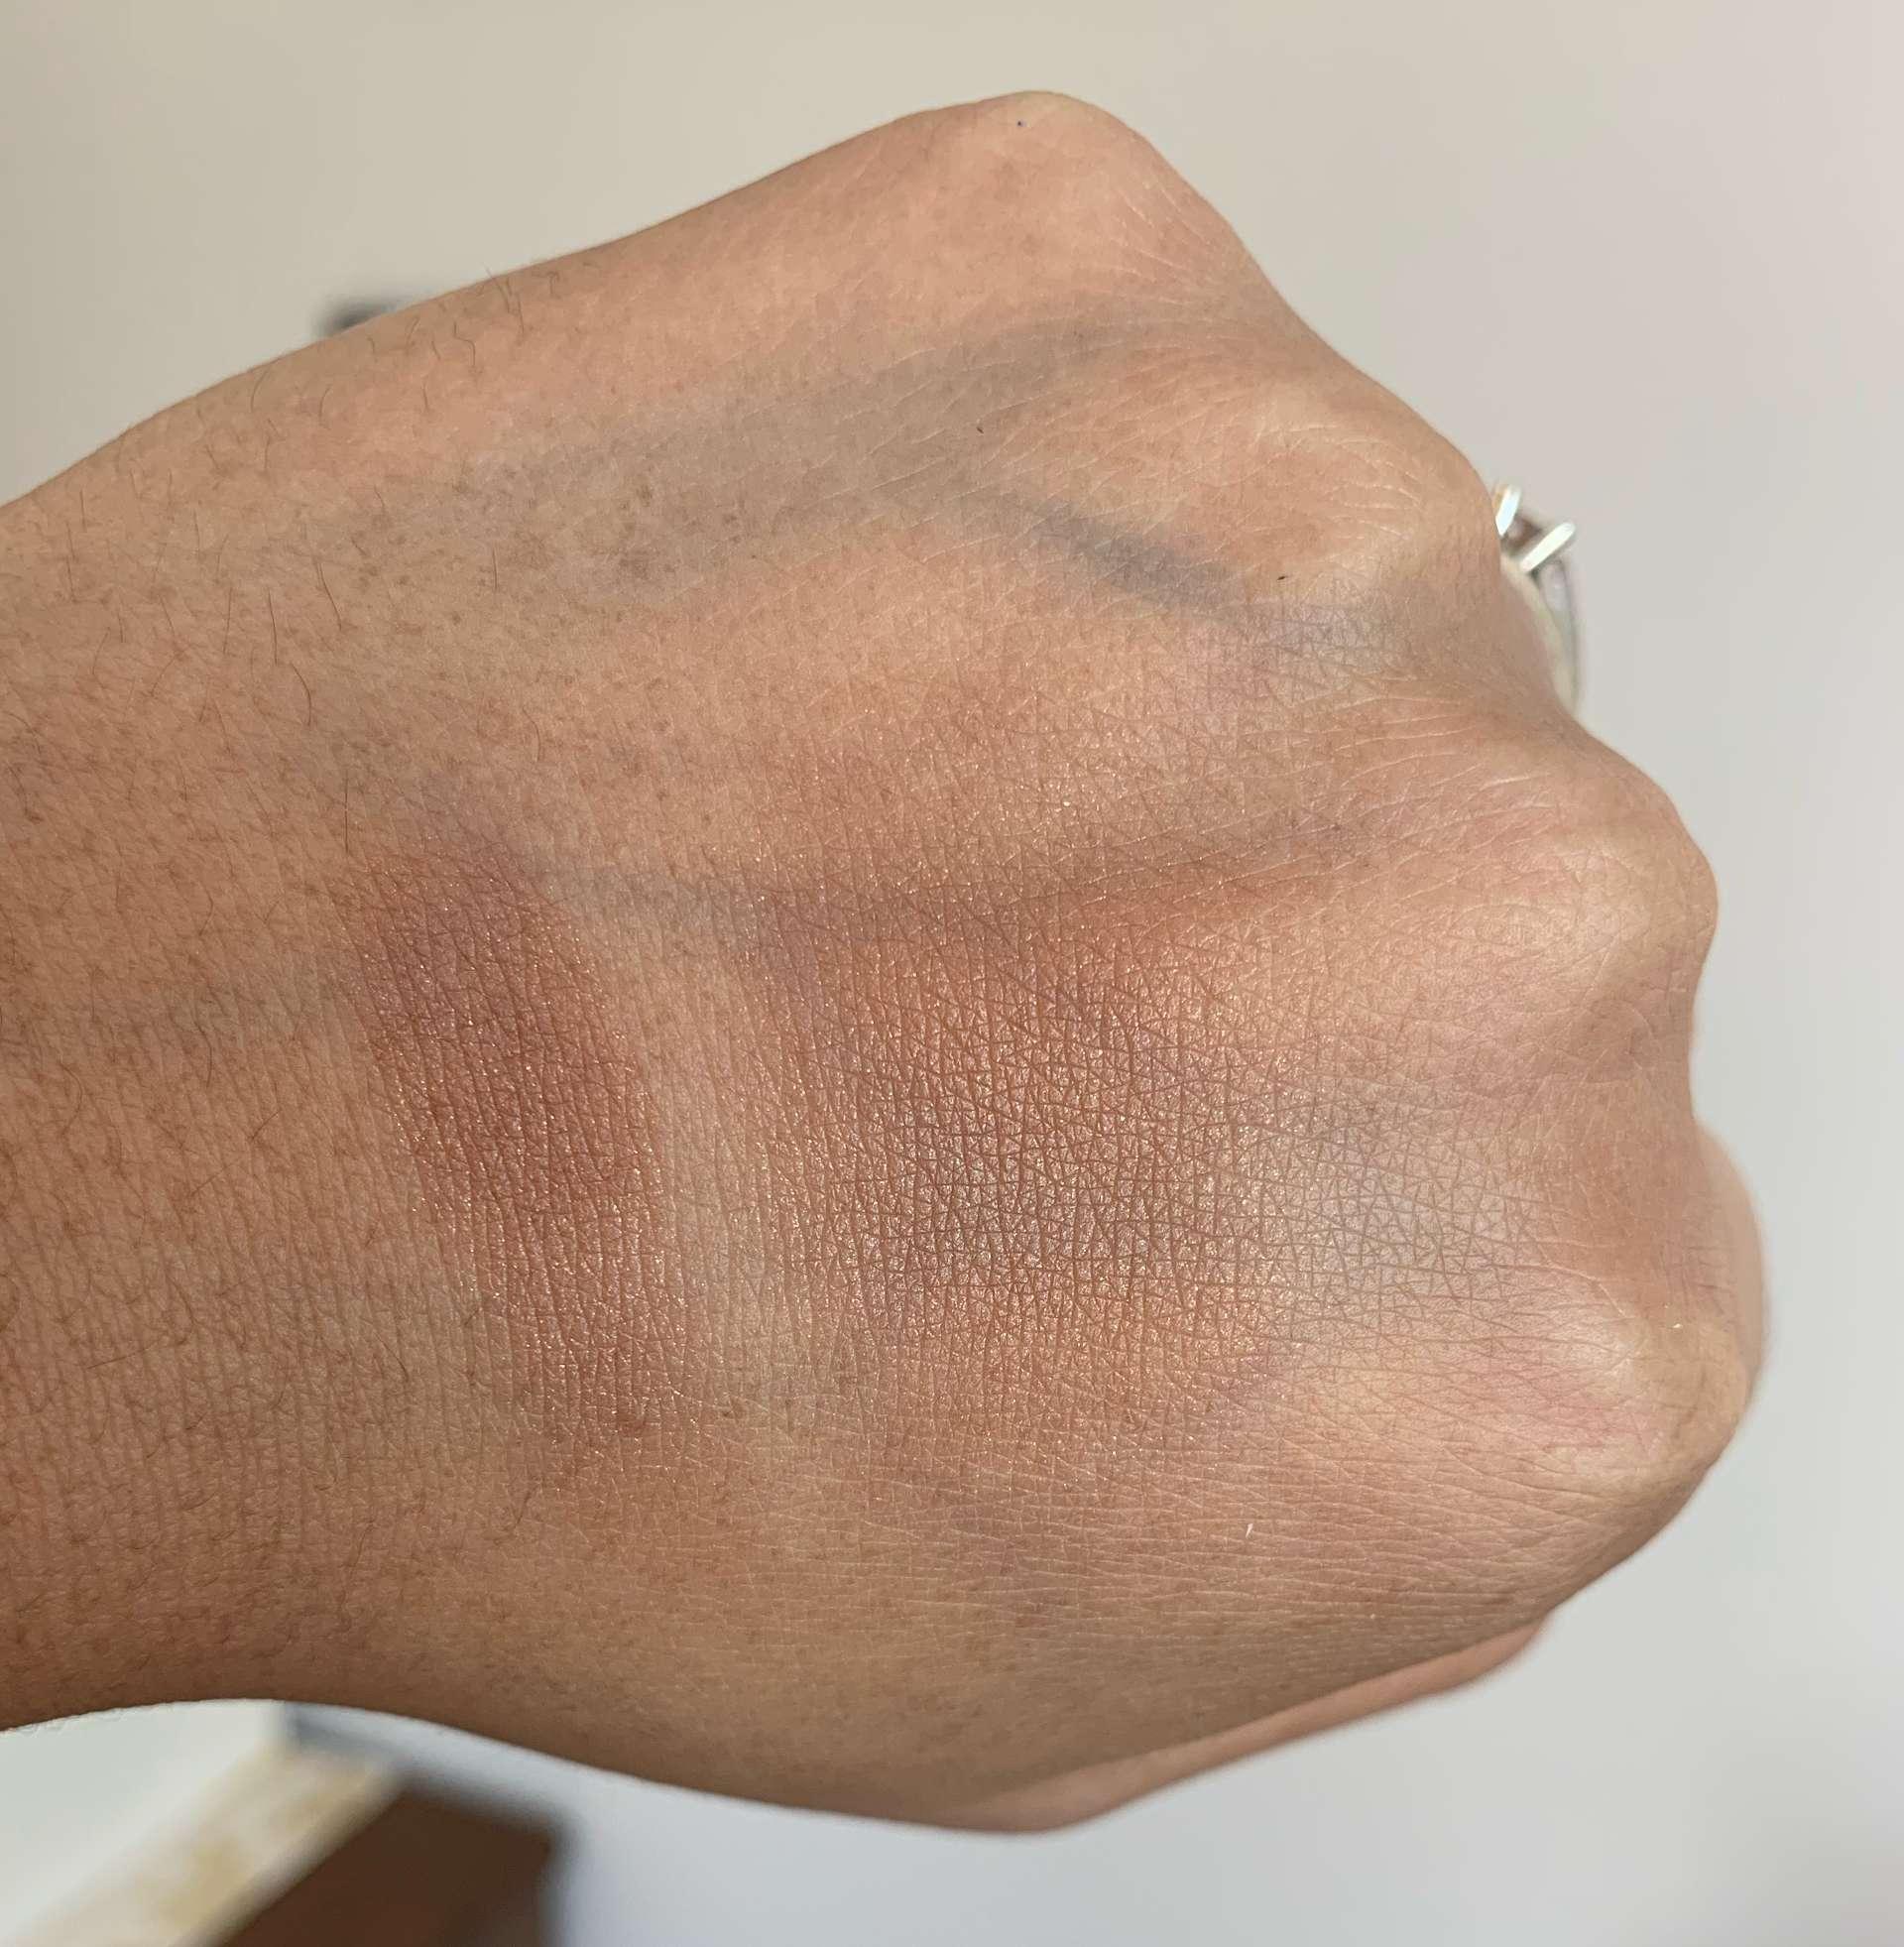 L'oreal True Match Lumi Bronzer 03 Deep Swatch on Medium Dark Skin